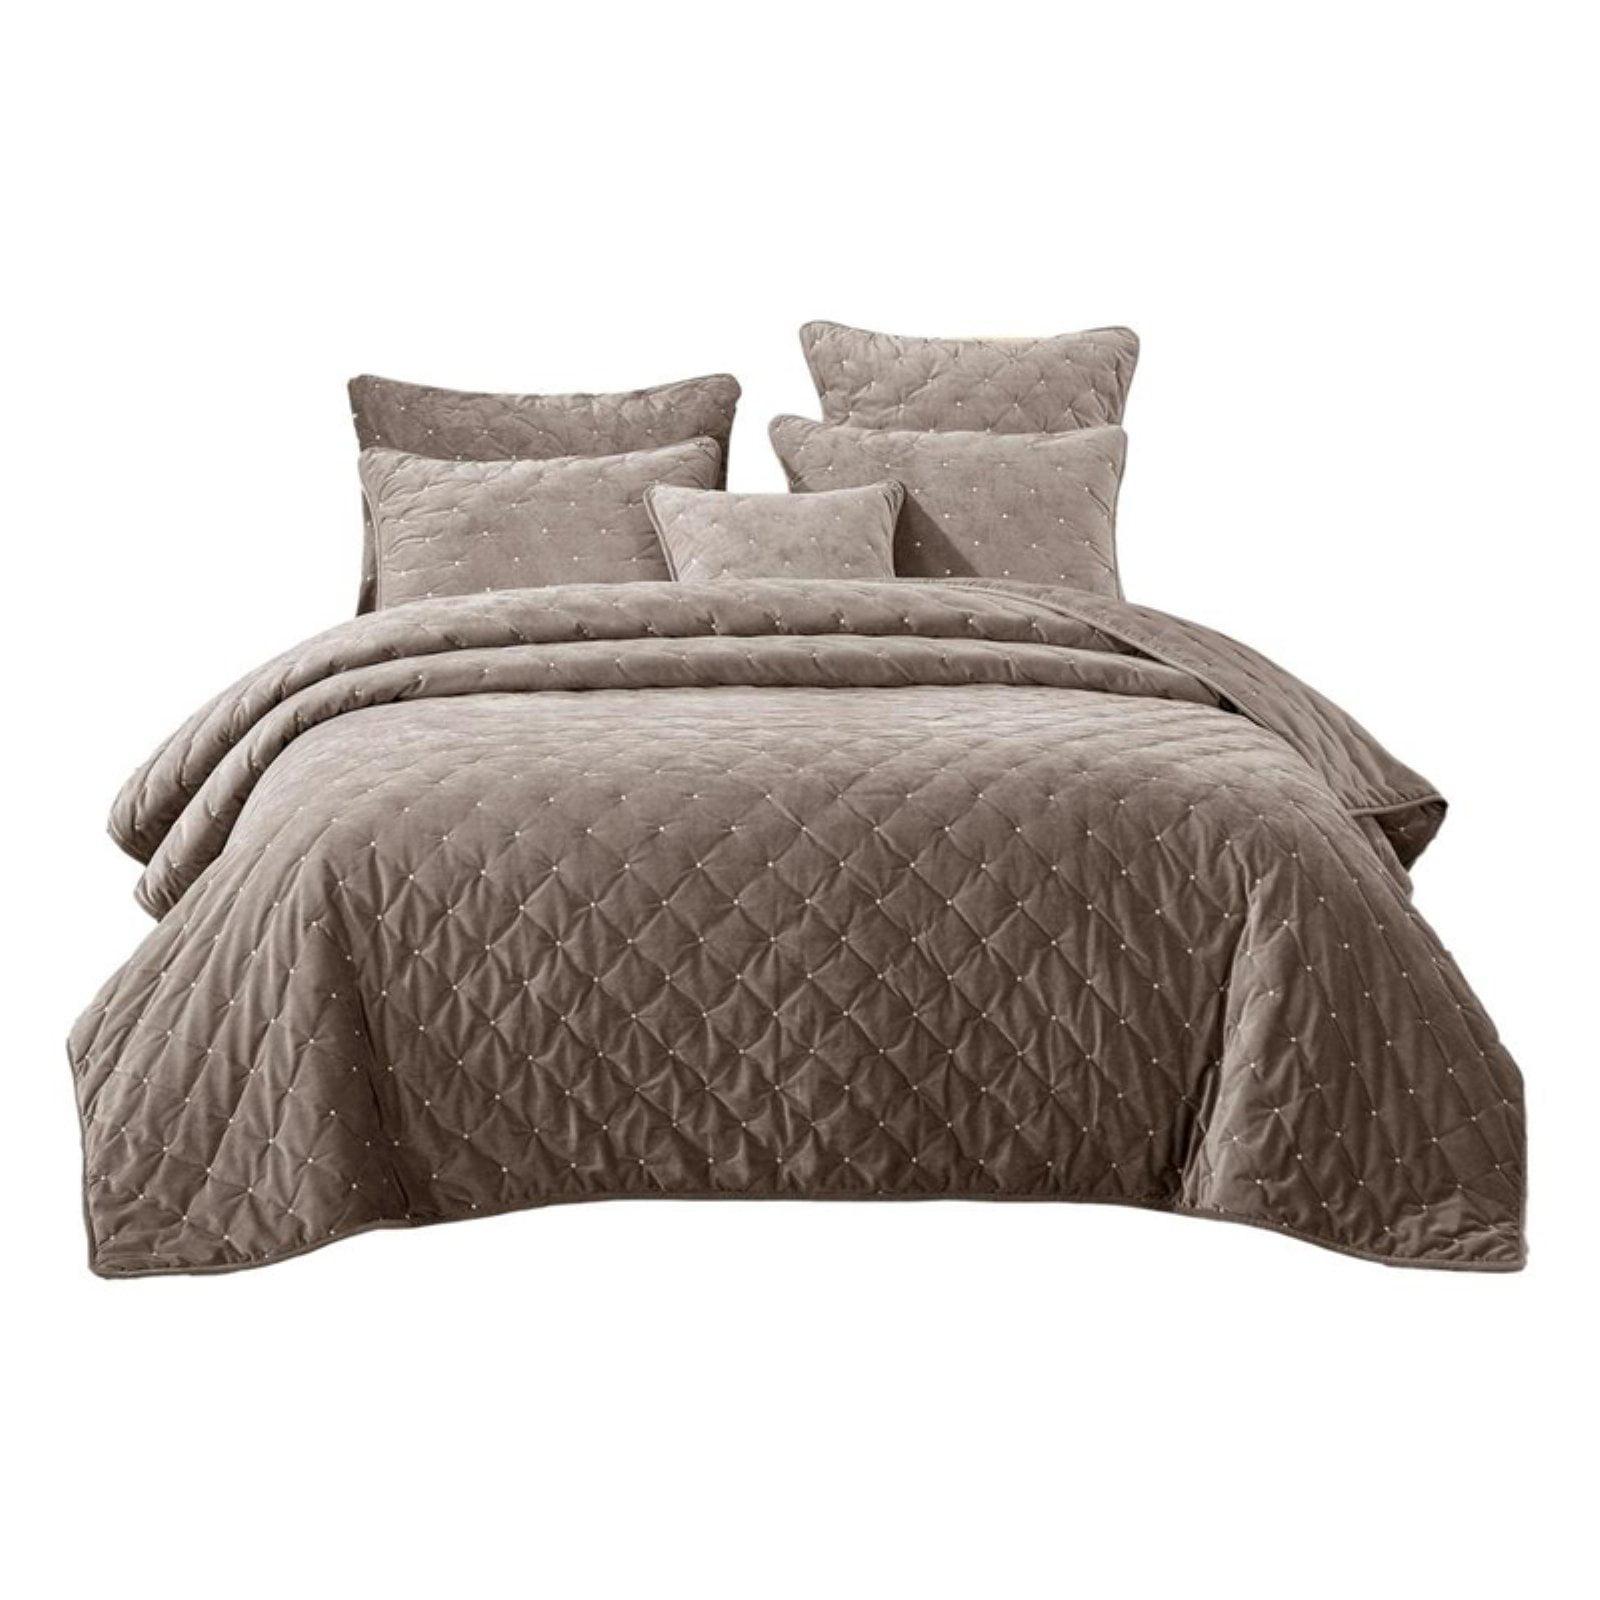 Velvet Plush Diamond Tufted Bedspread Set by Tache Home Fashion